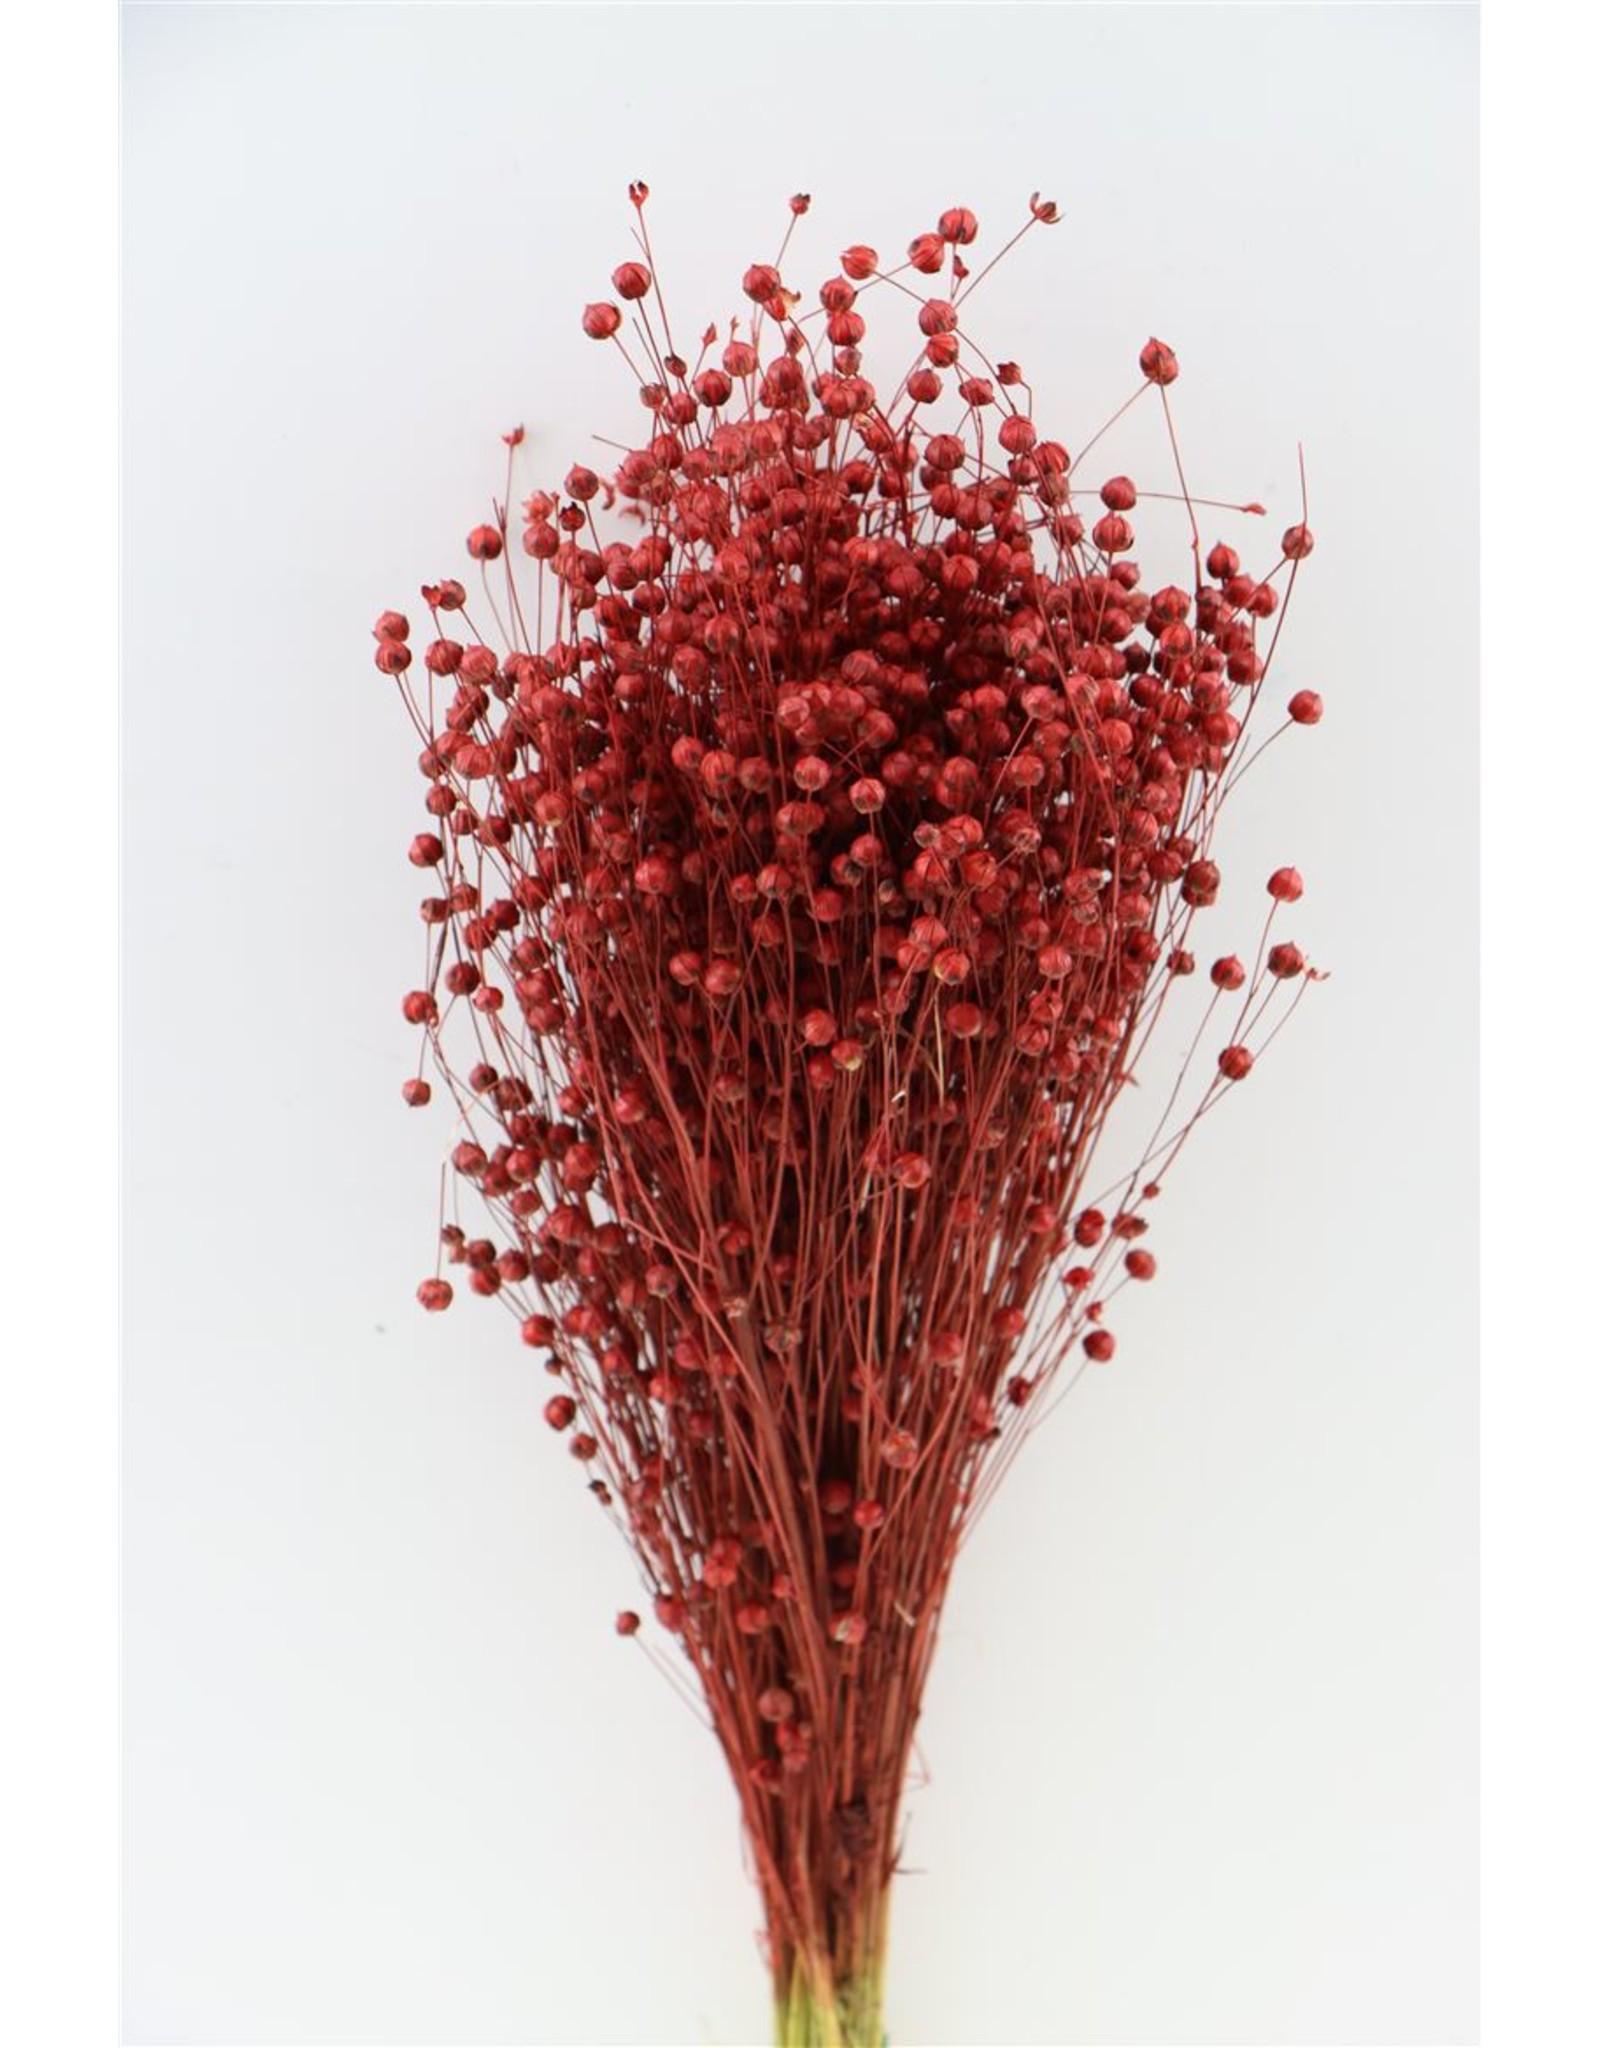 GF Dried Lino Vlas Red Bunch x 5